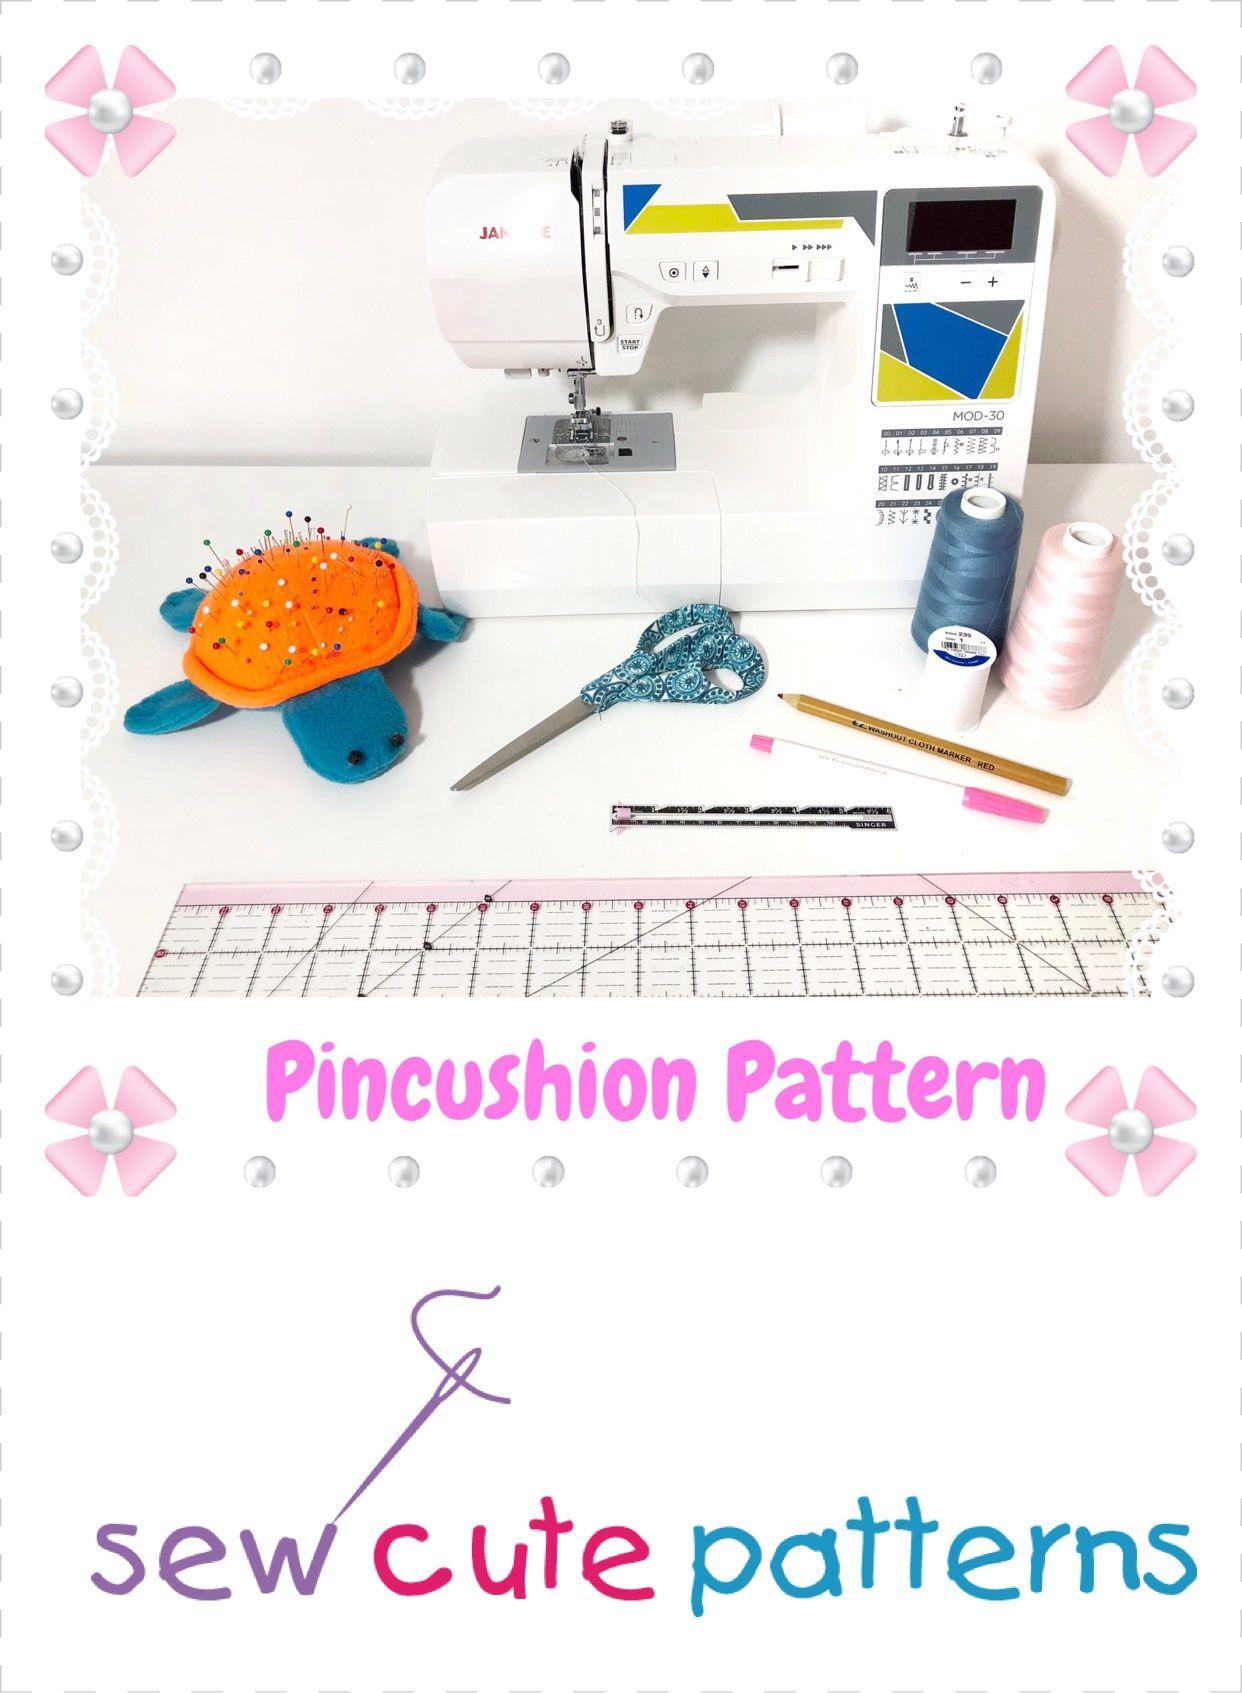 Sea Turtle Pin Cushion Sewing Pattern | Sew Cute Patterns ...